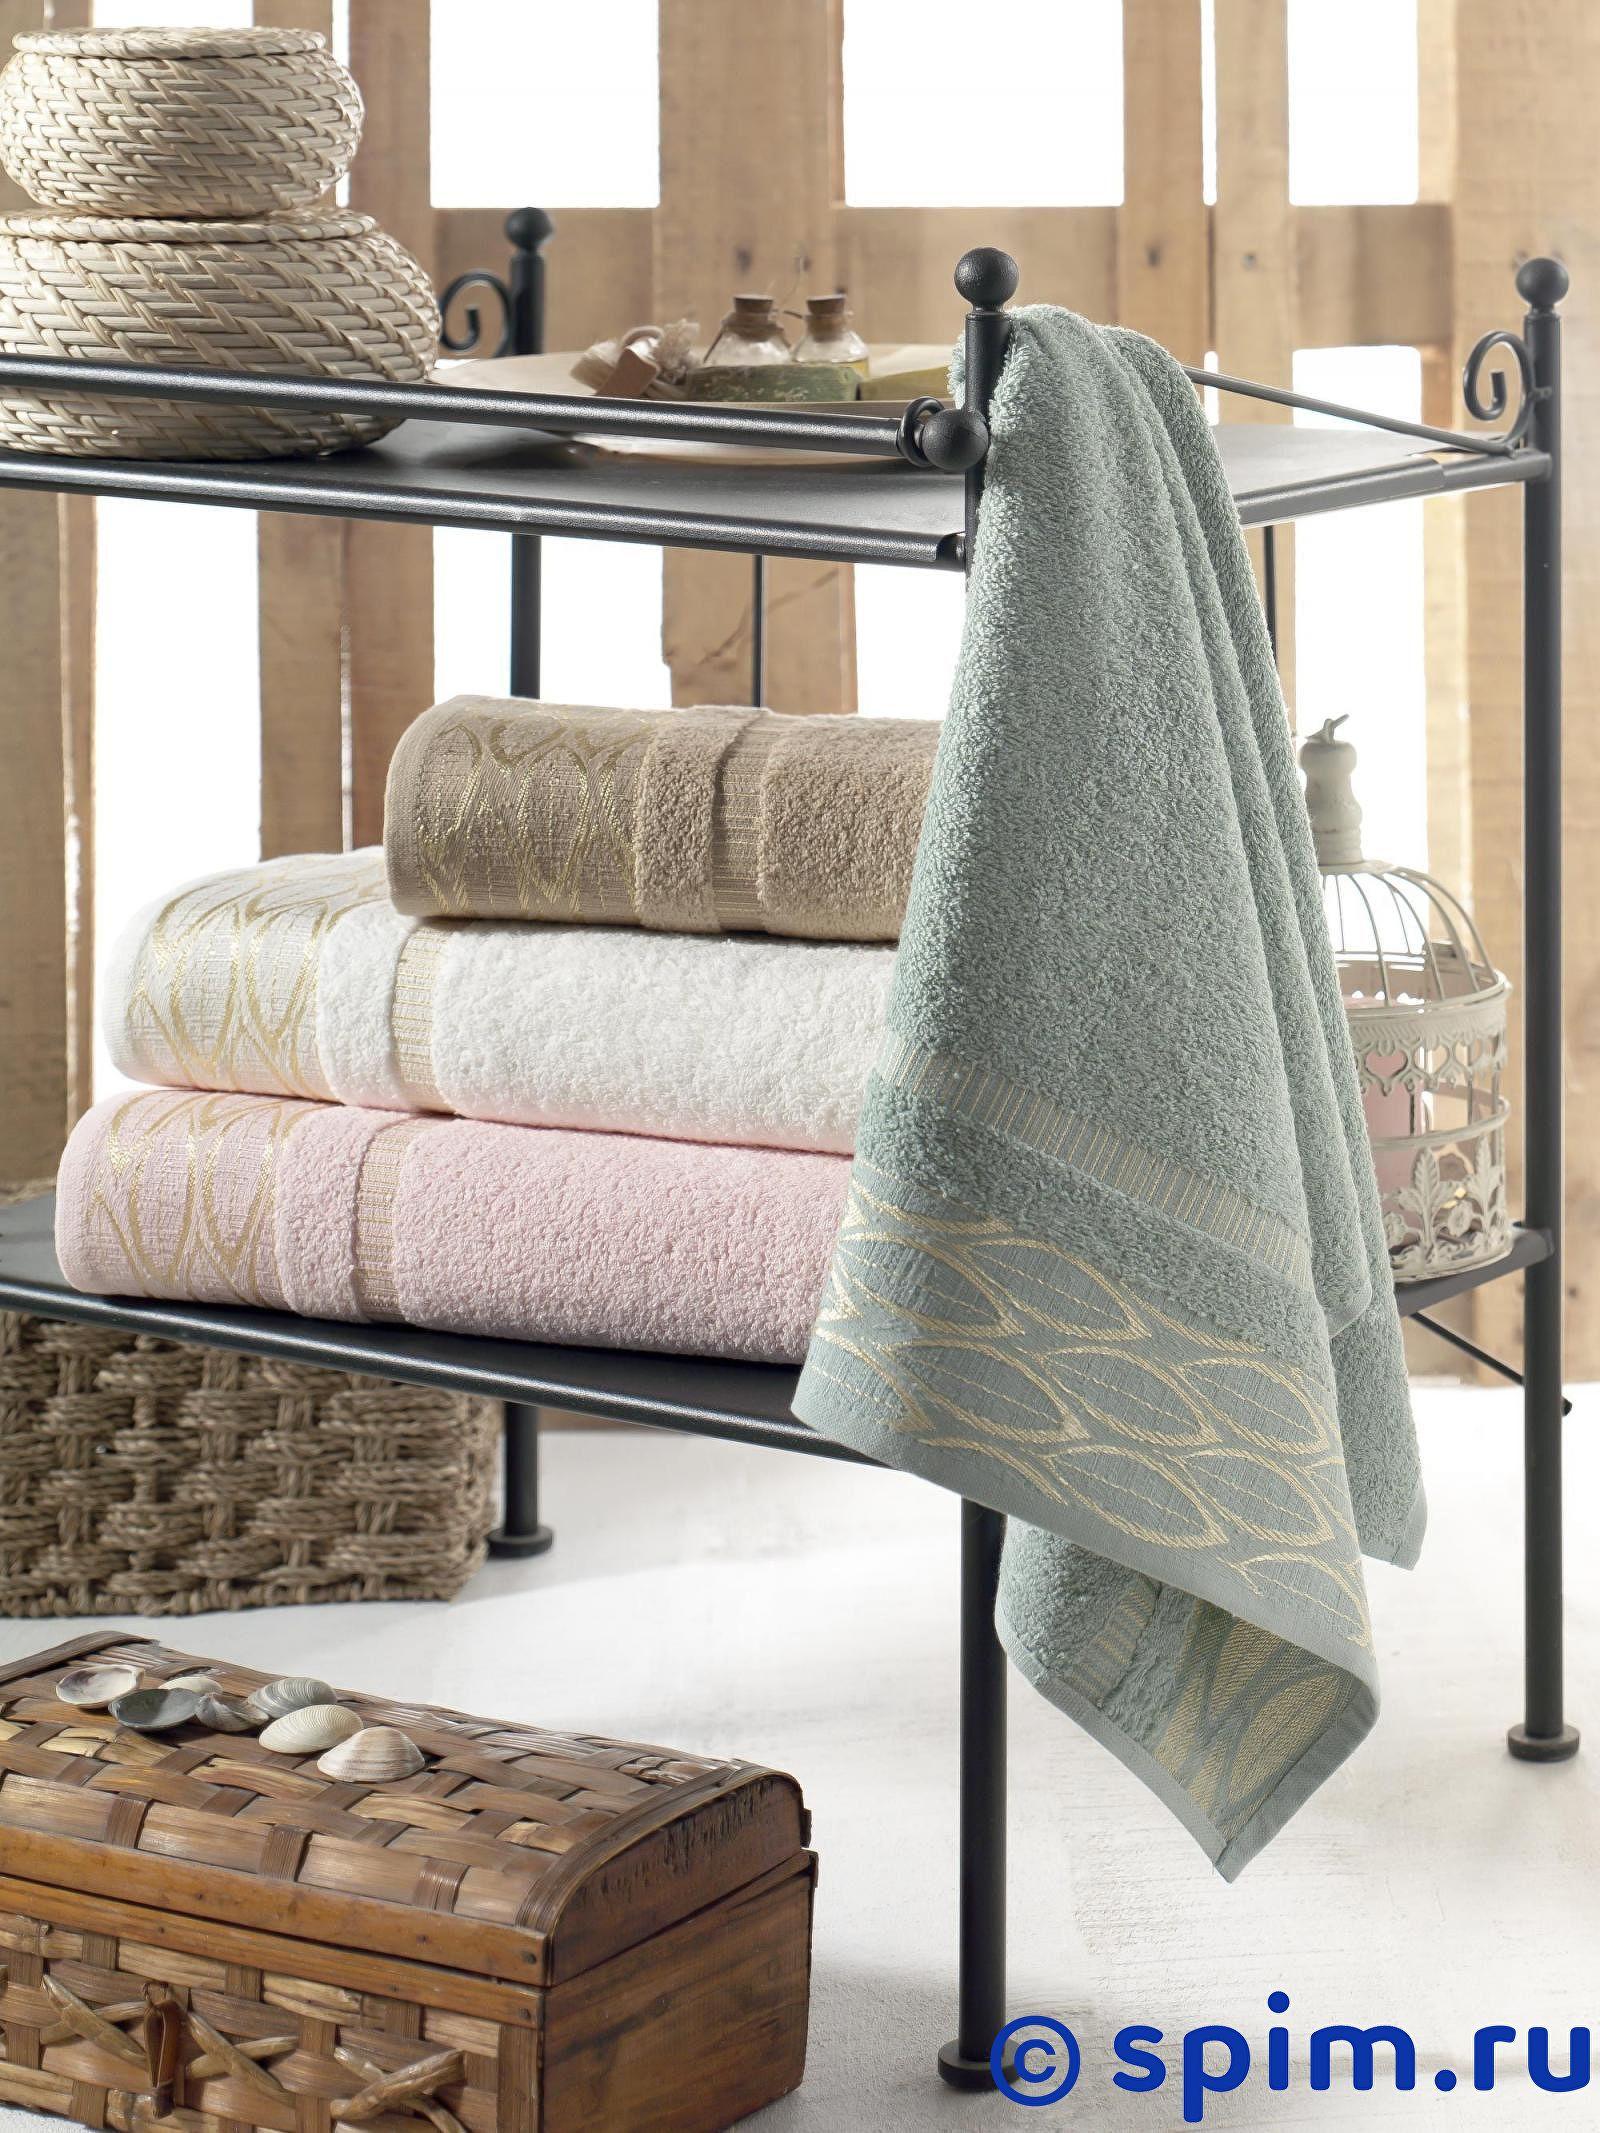 Набор из 4-х полотенец Do&co Leaves 50х90 см полотенца do n co полотенце lady цвет мятный набор